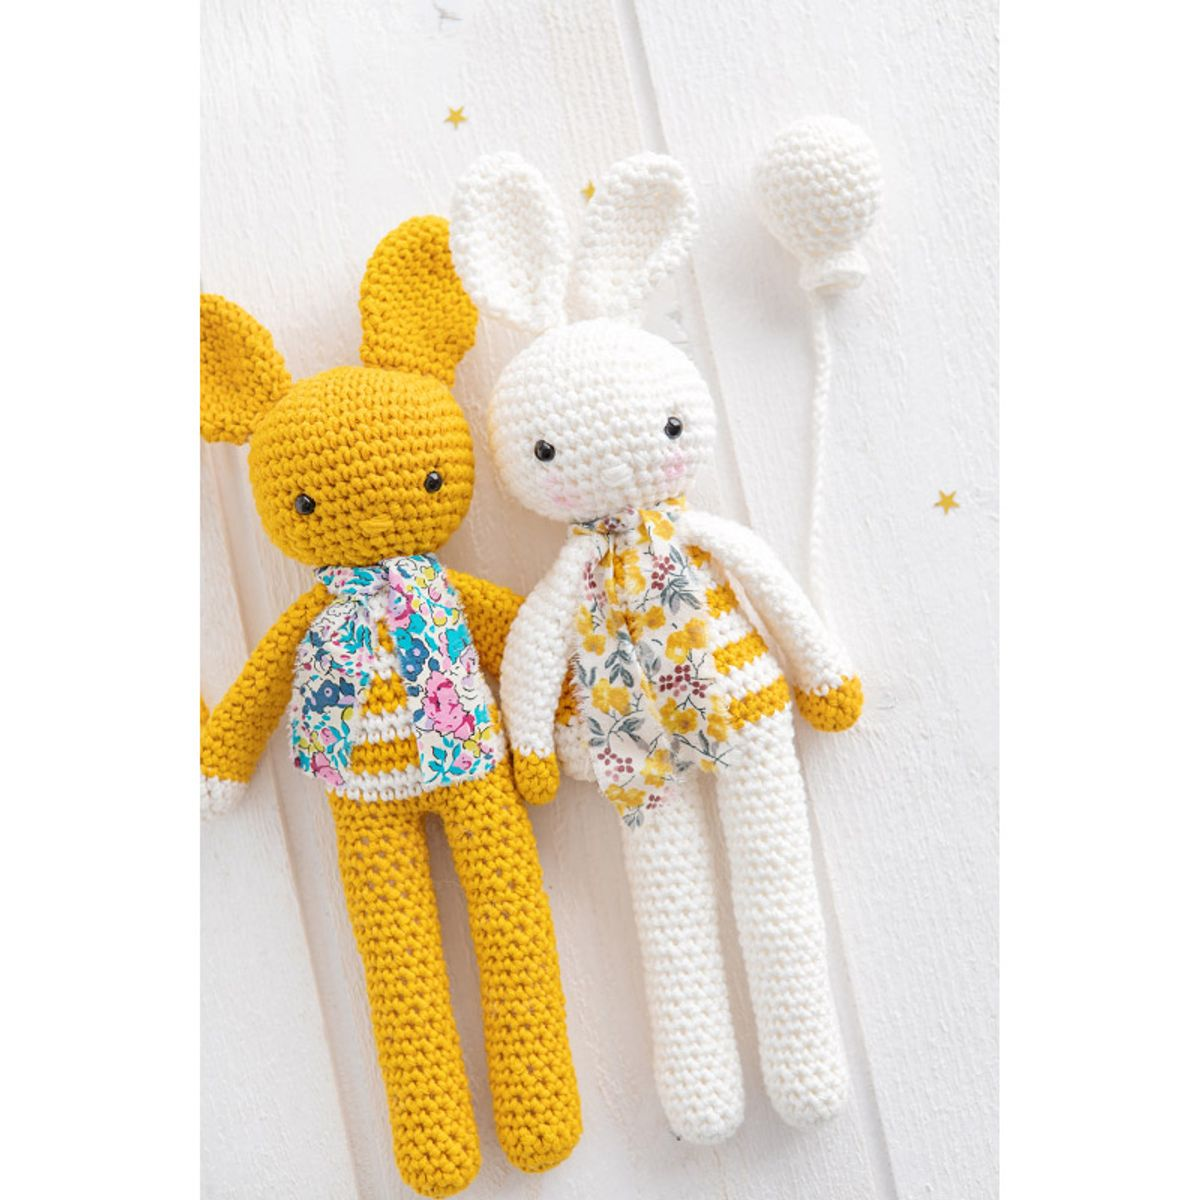 Kit doudous lapins en crochet - Need somebunny